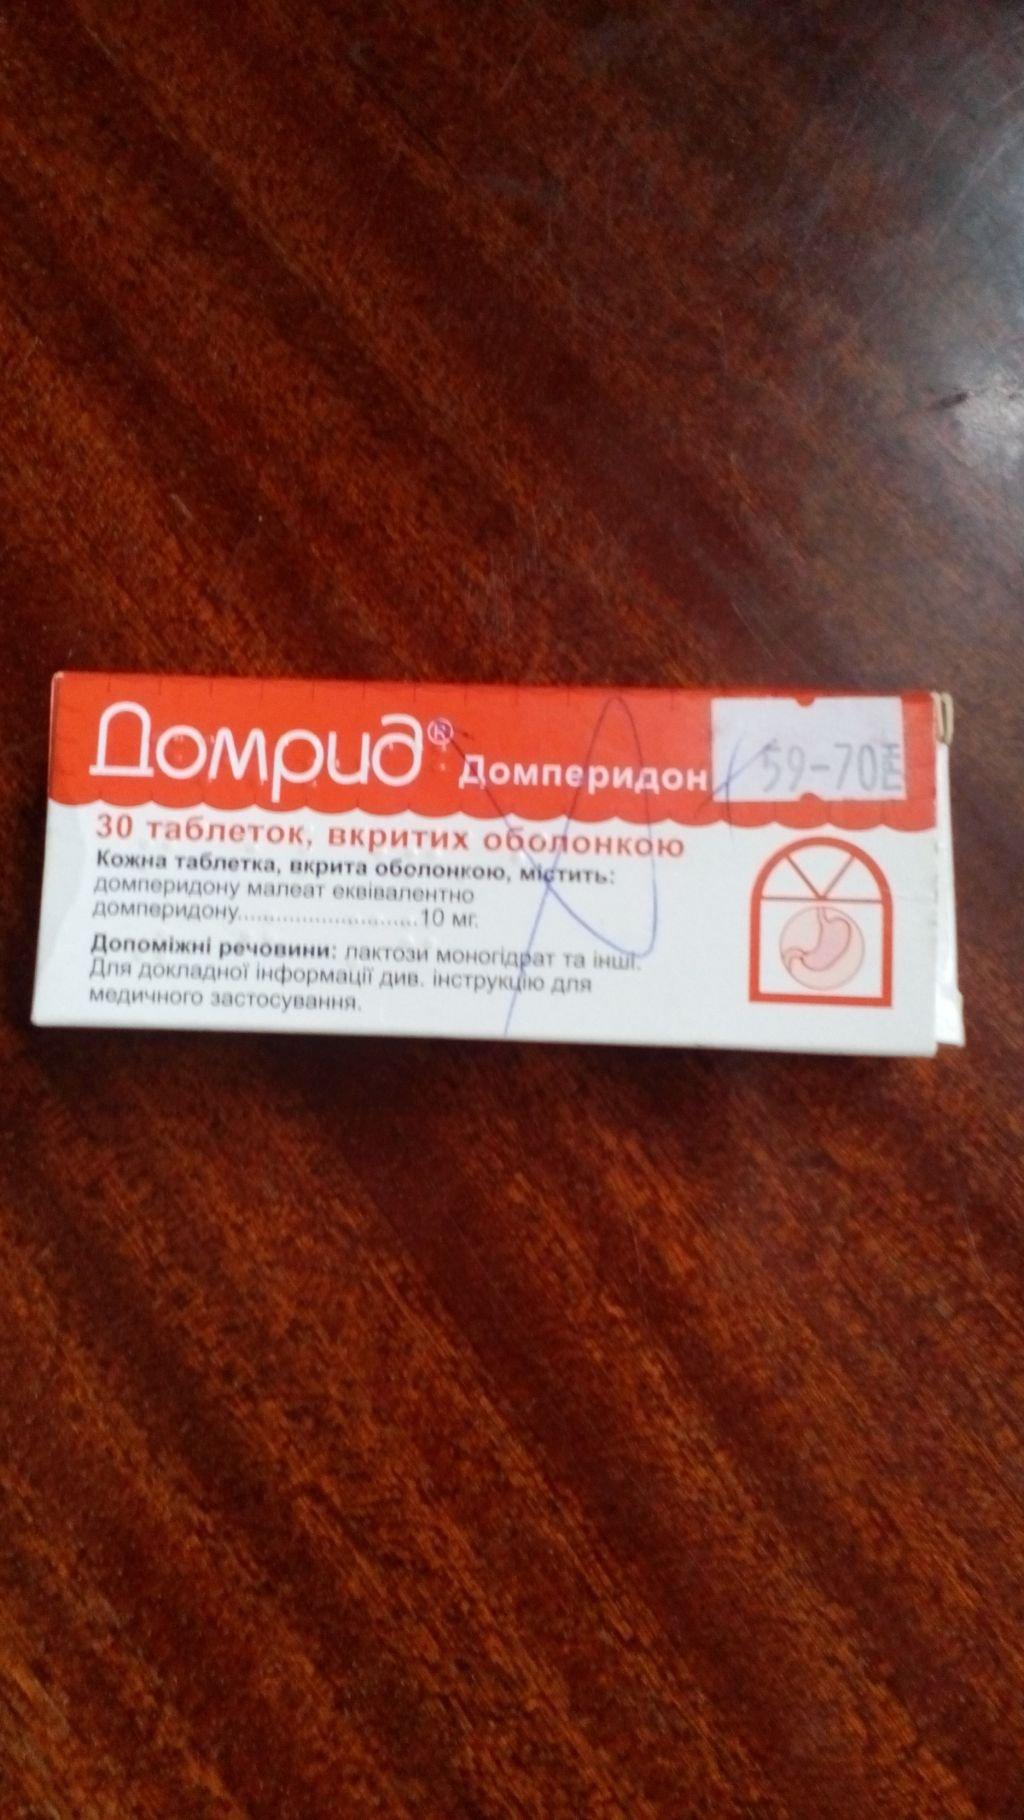 Таблетки Домрид при тошноте и рвоте